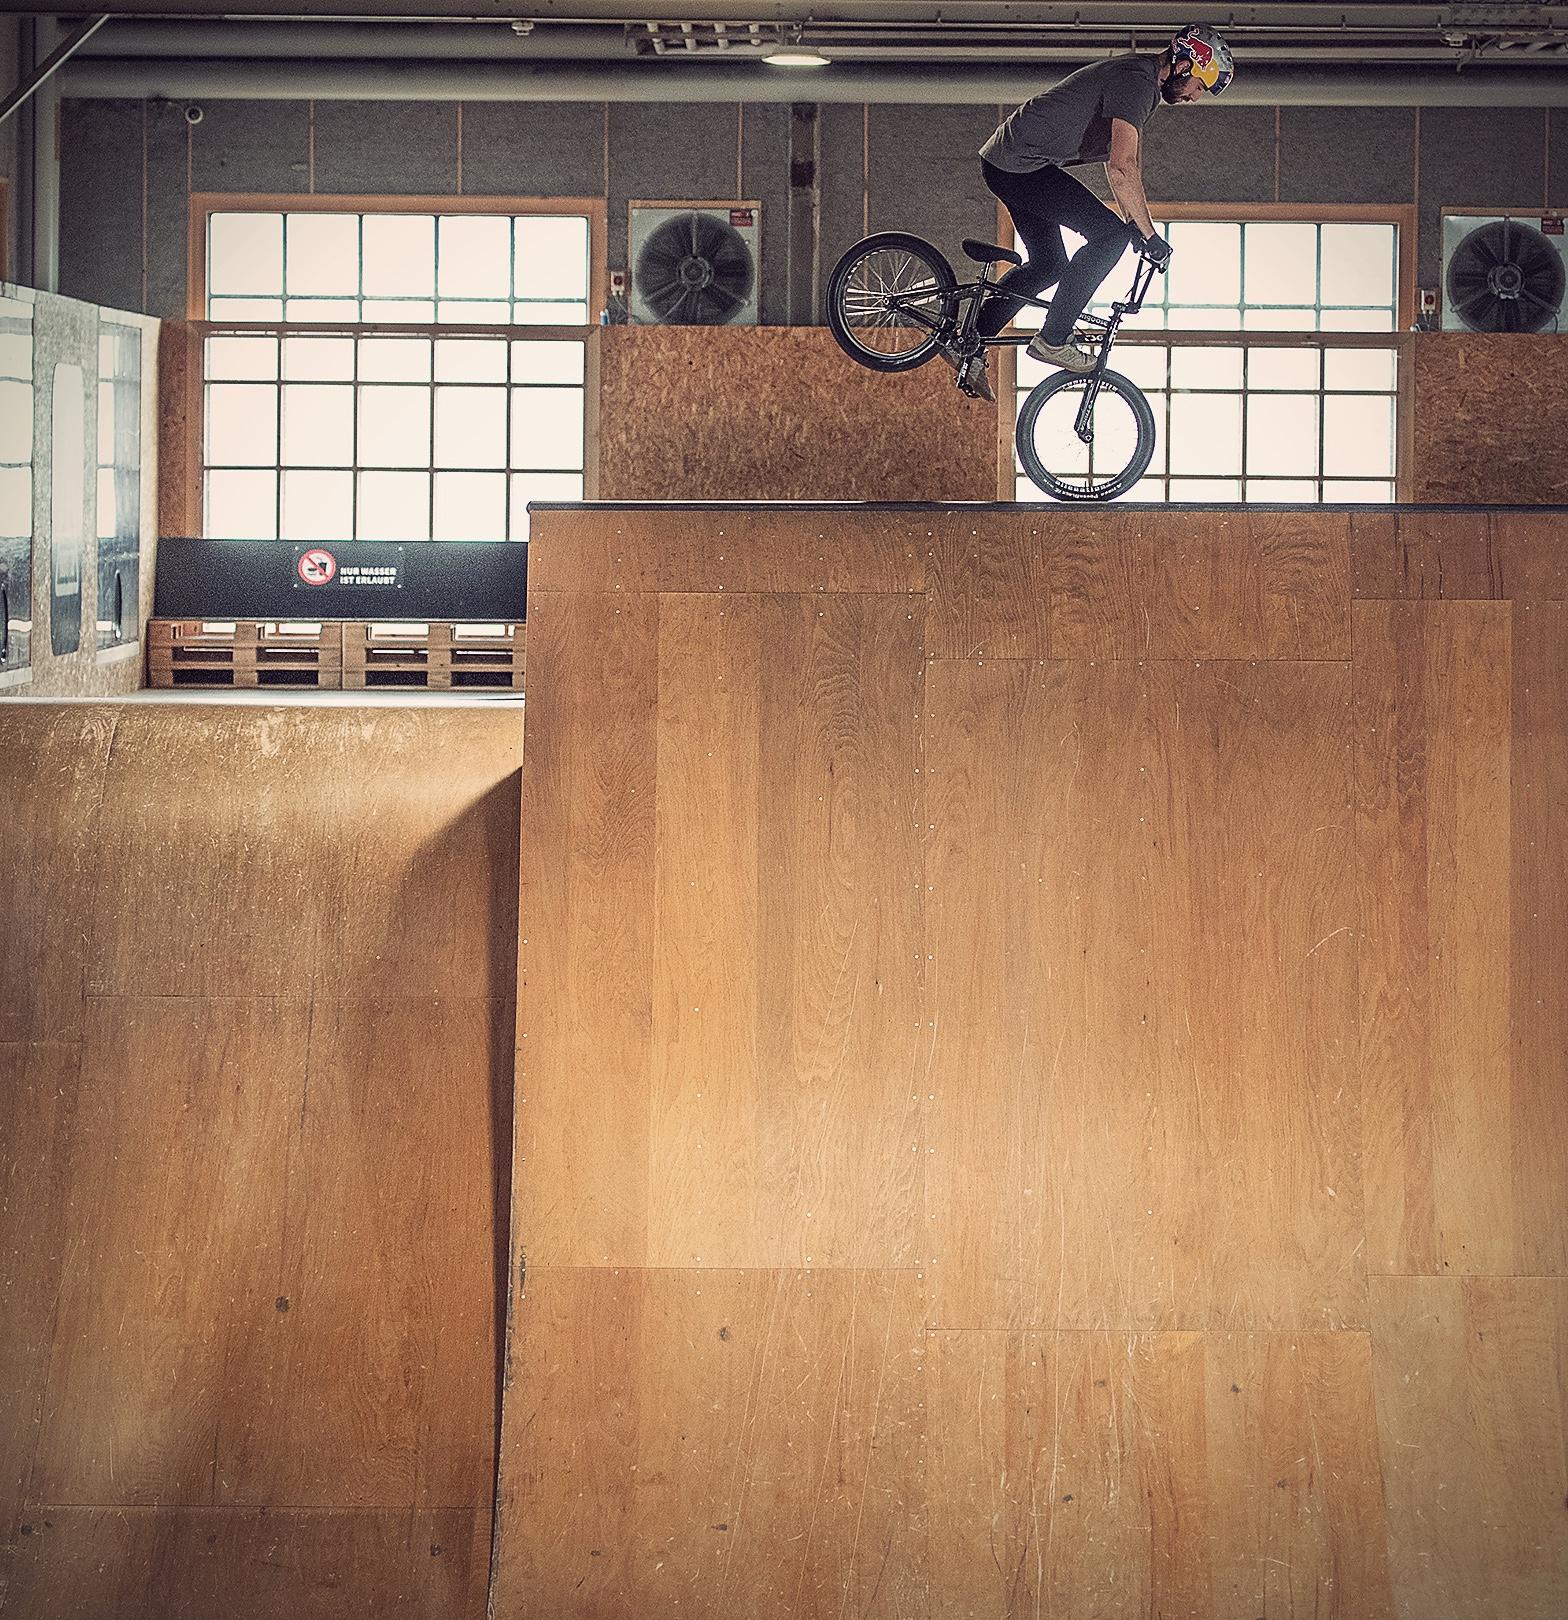 Footjam by Daniel Wedemeijer bmx skillspark